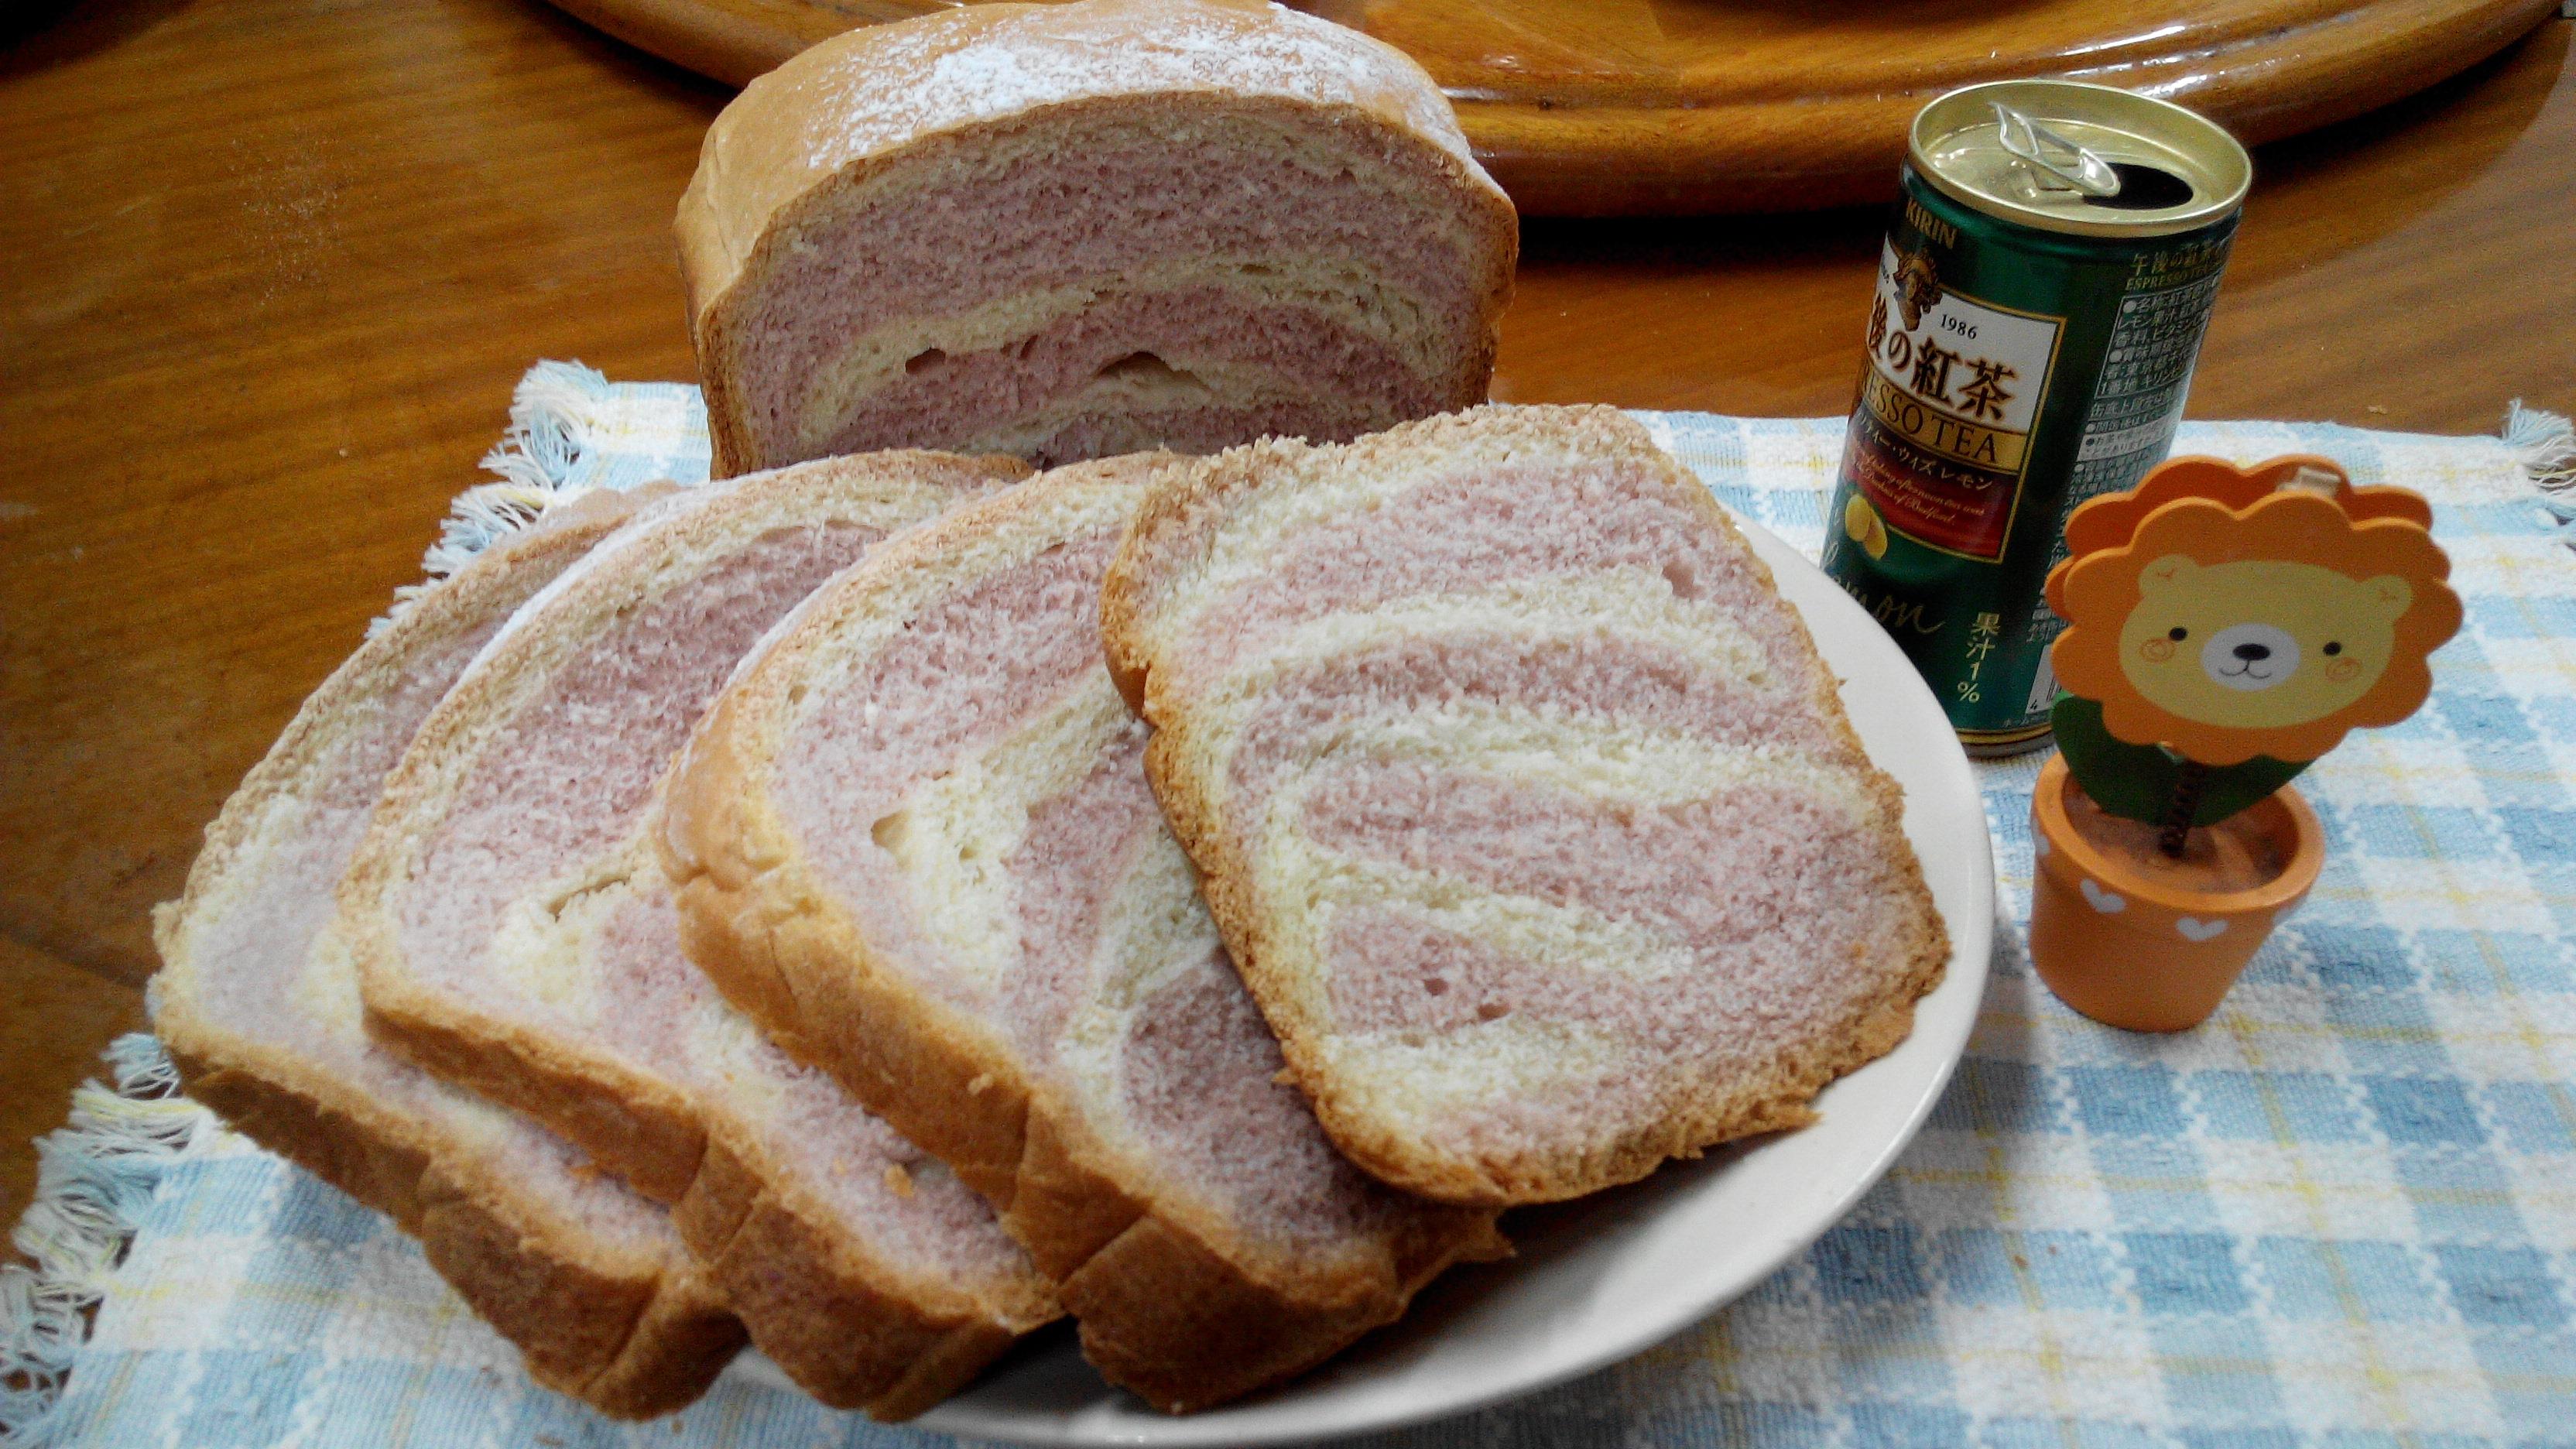 斑馬紋麵包-パンの鍋(胖鍋)製麵包機